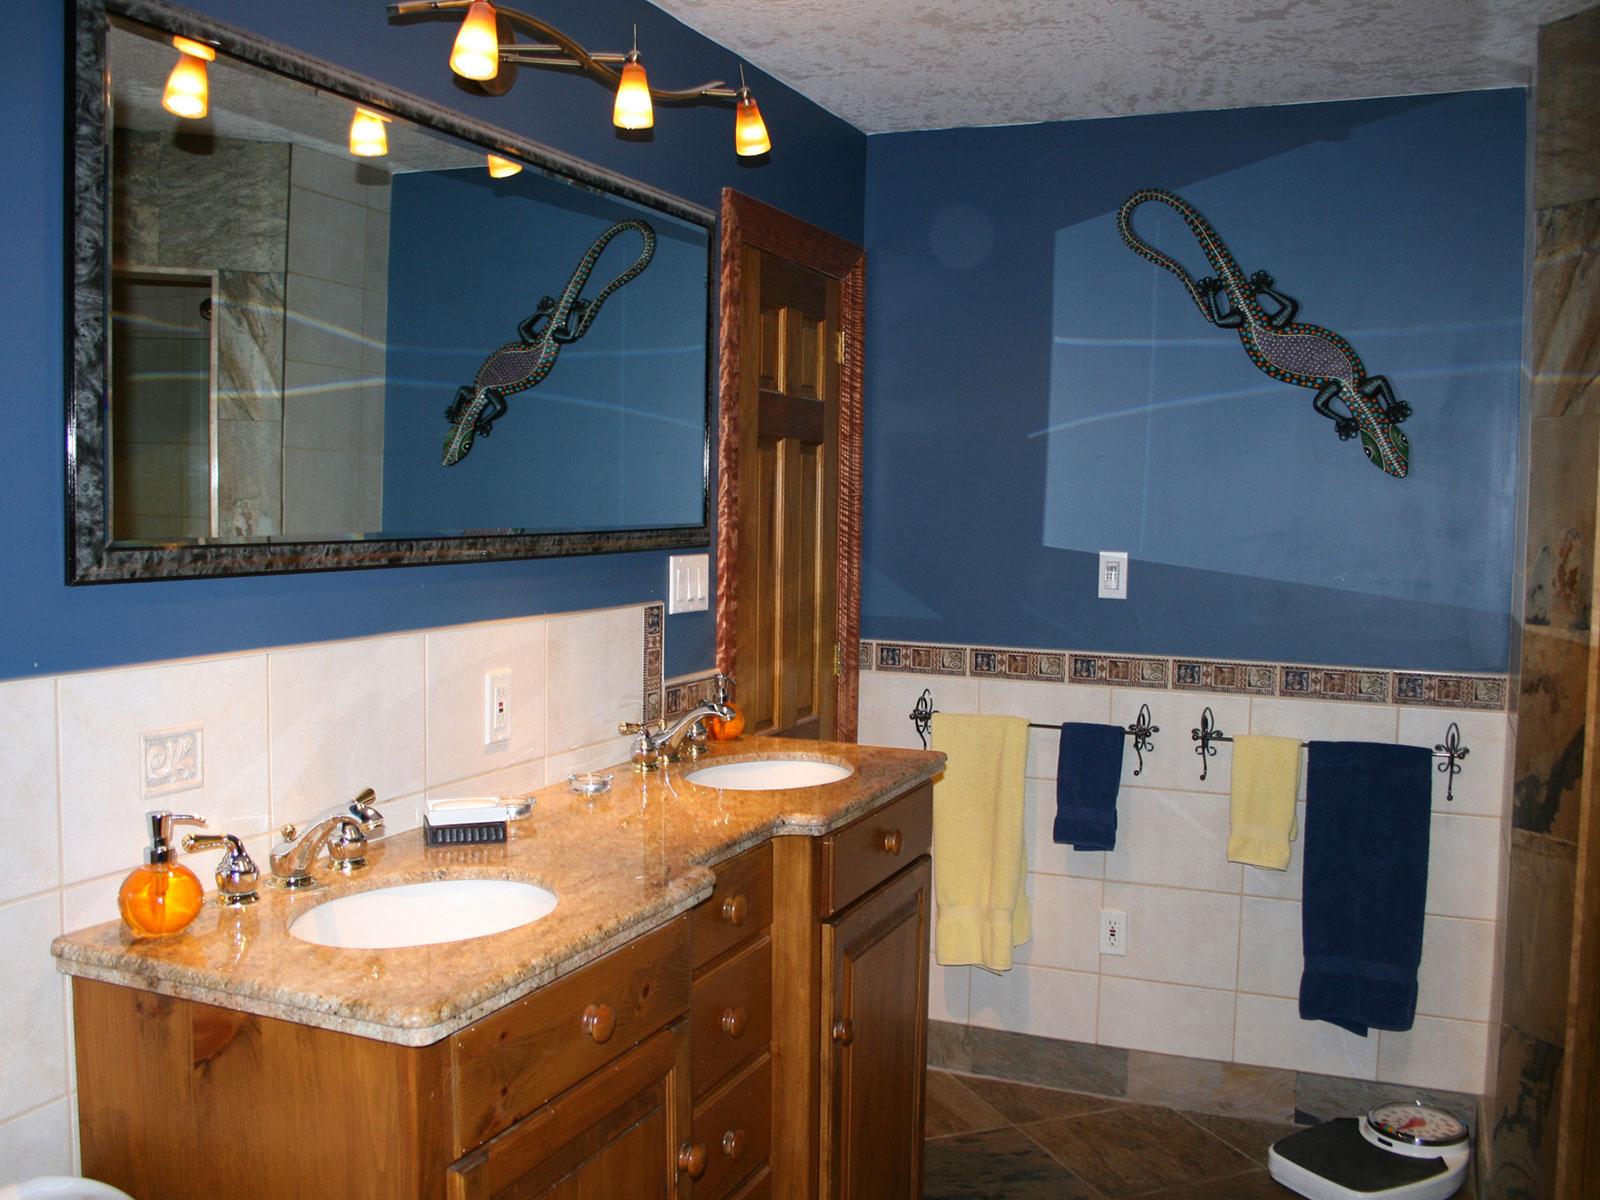 Bathroom Double Sinks Pine Vanity